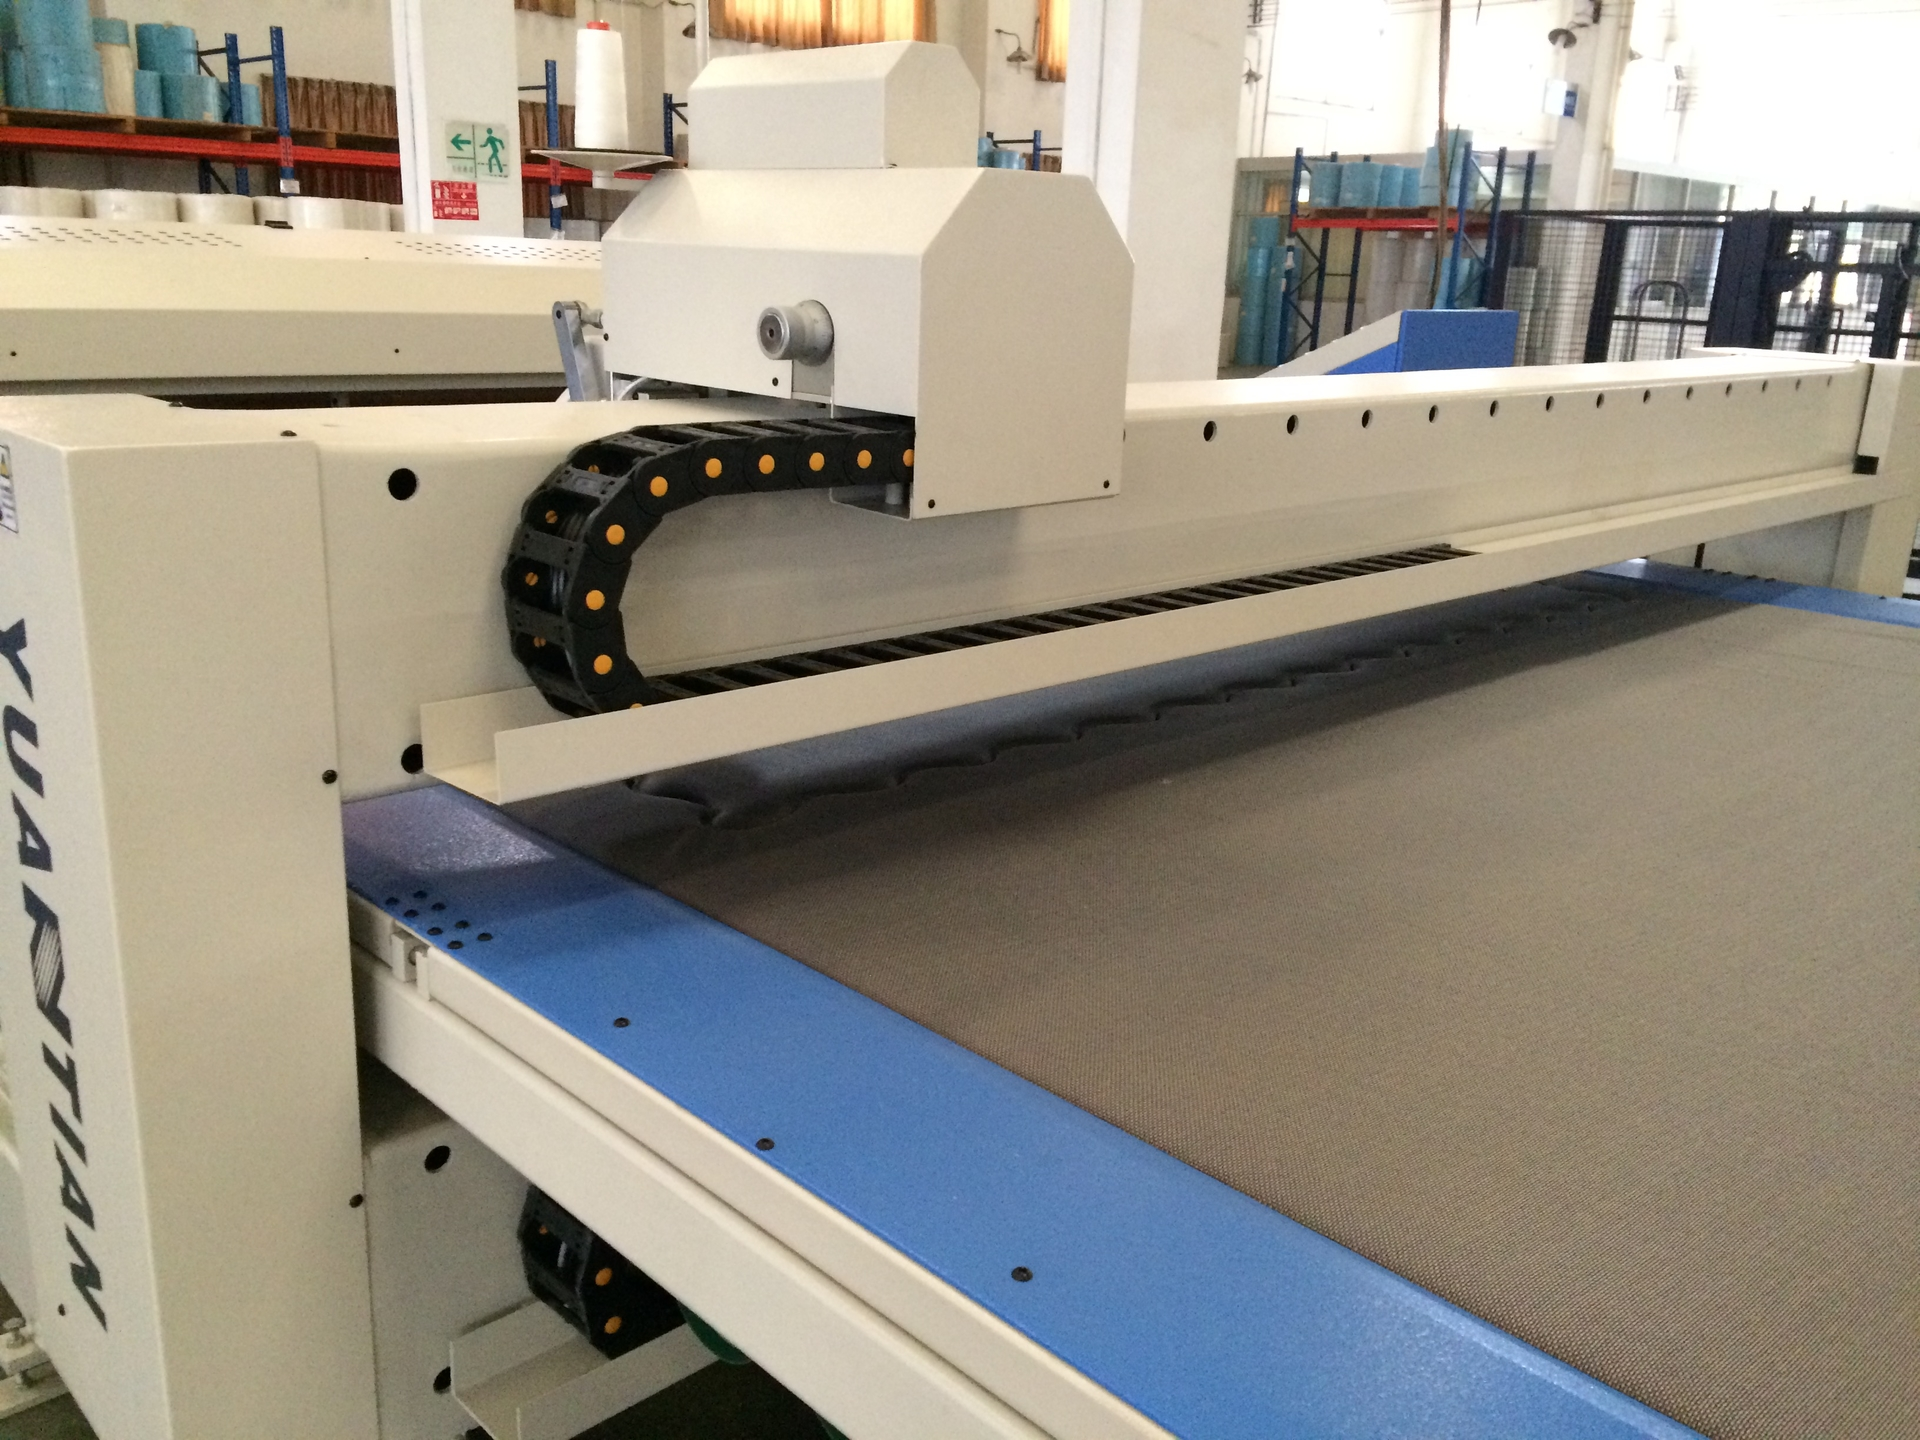 DZHF-1G Single Needle Chain Stitch Mattress Quilting Machine